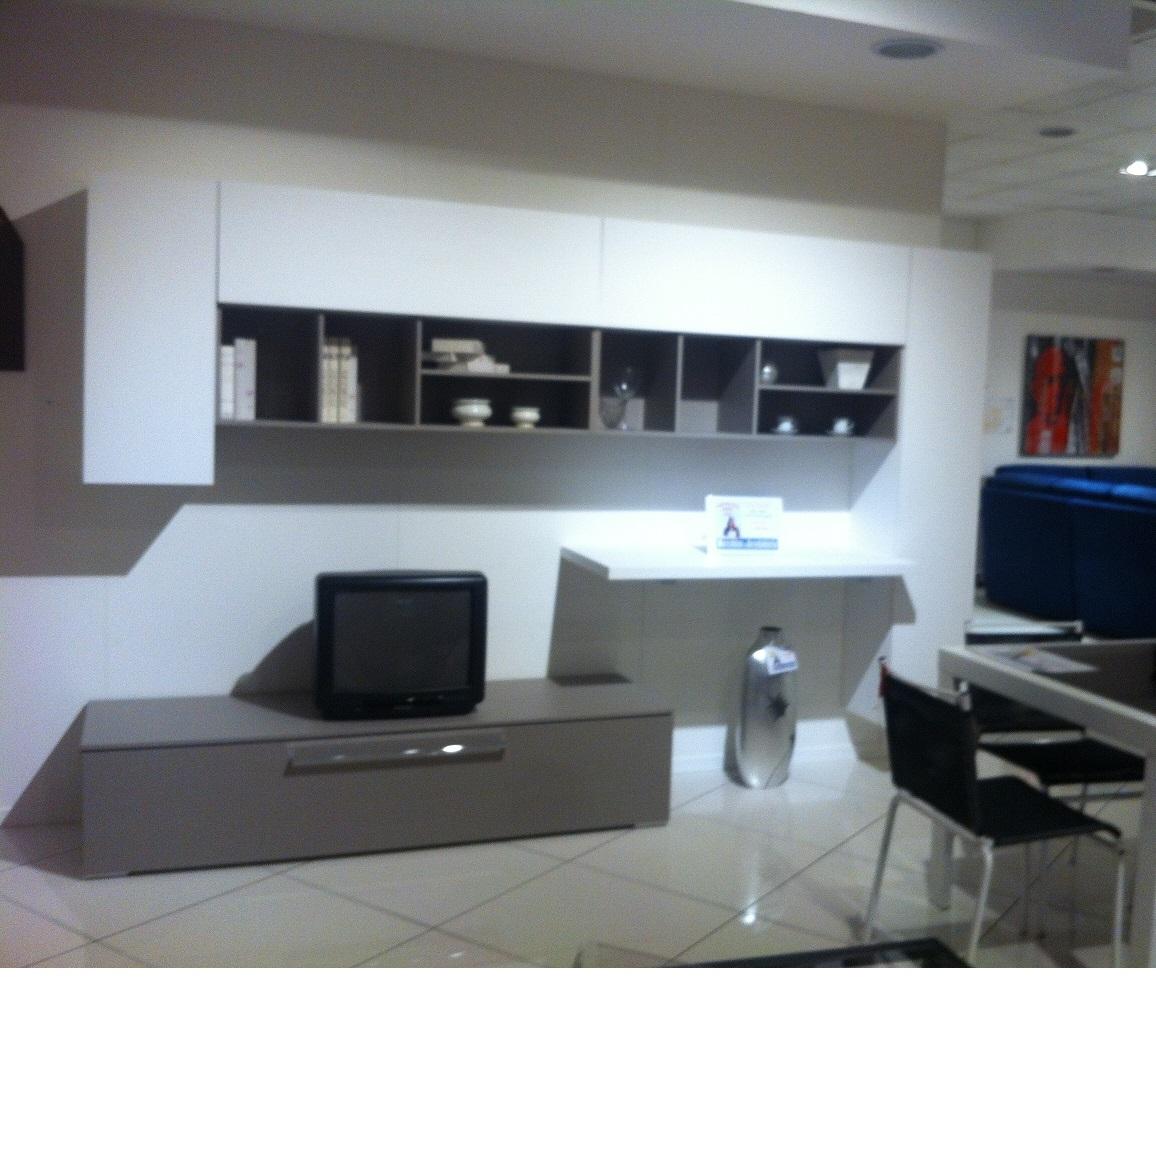 Bonaldo Porta Tv Moderno Panorama Pictures to pin on Pinterest